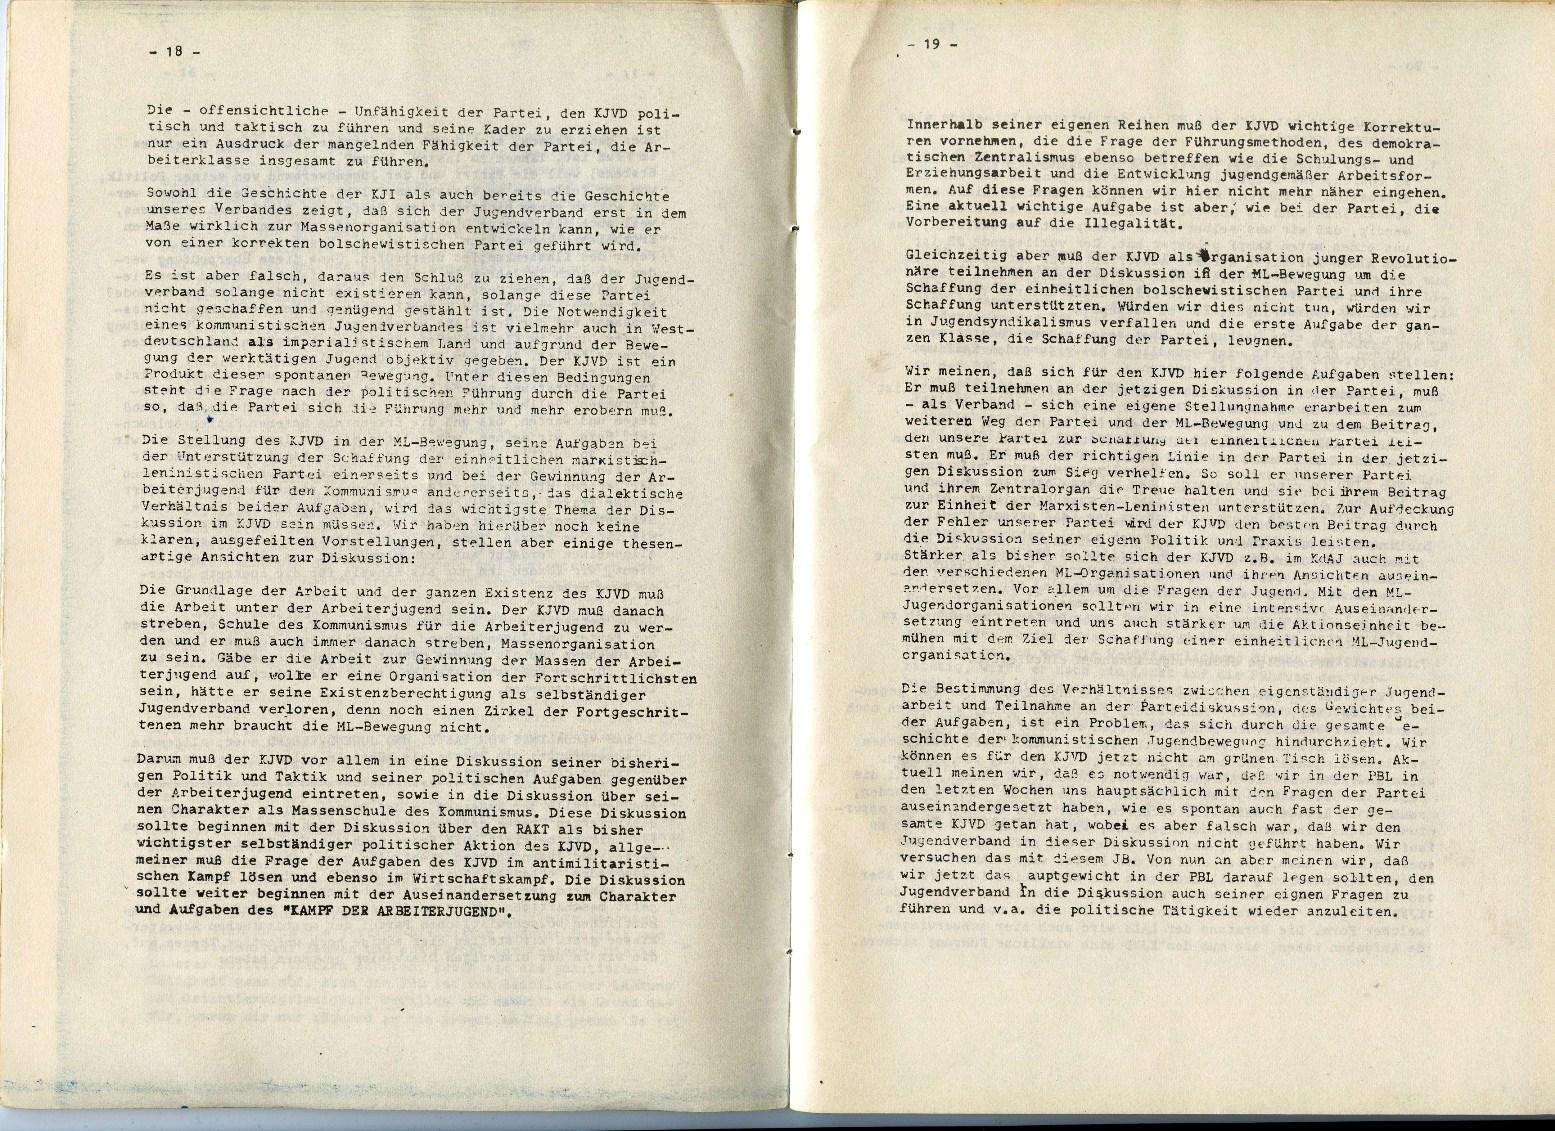 ZB_Universitas_1972_13